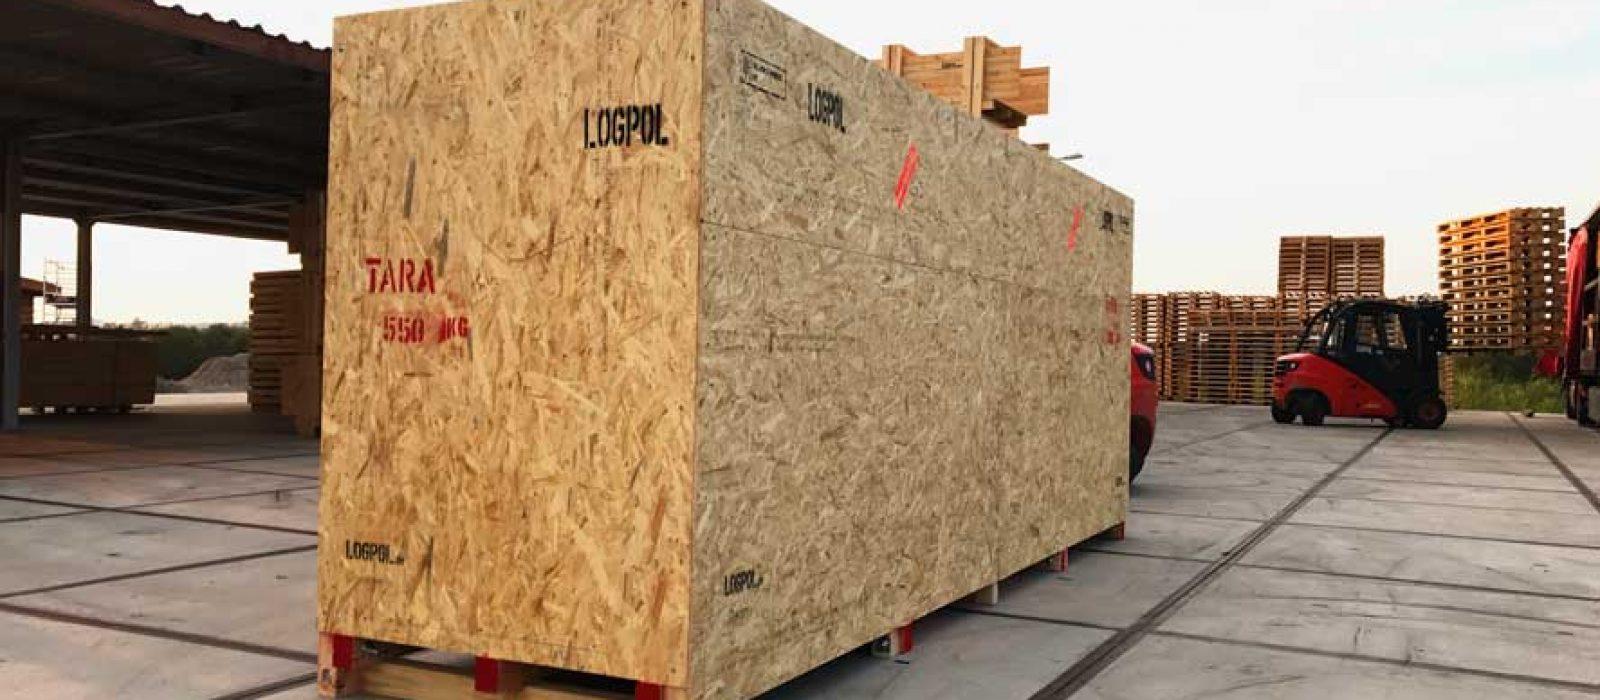 LOGPOL-Holzkisten-Sonderbau